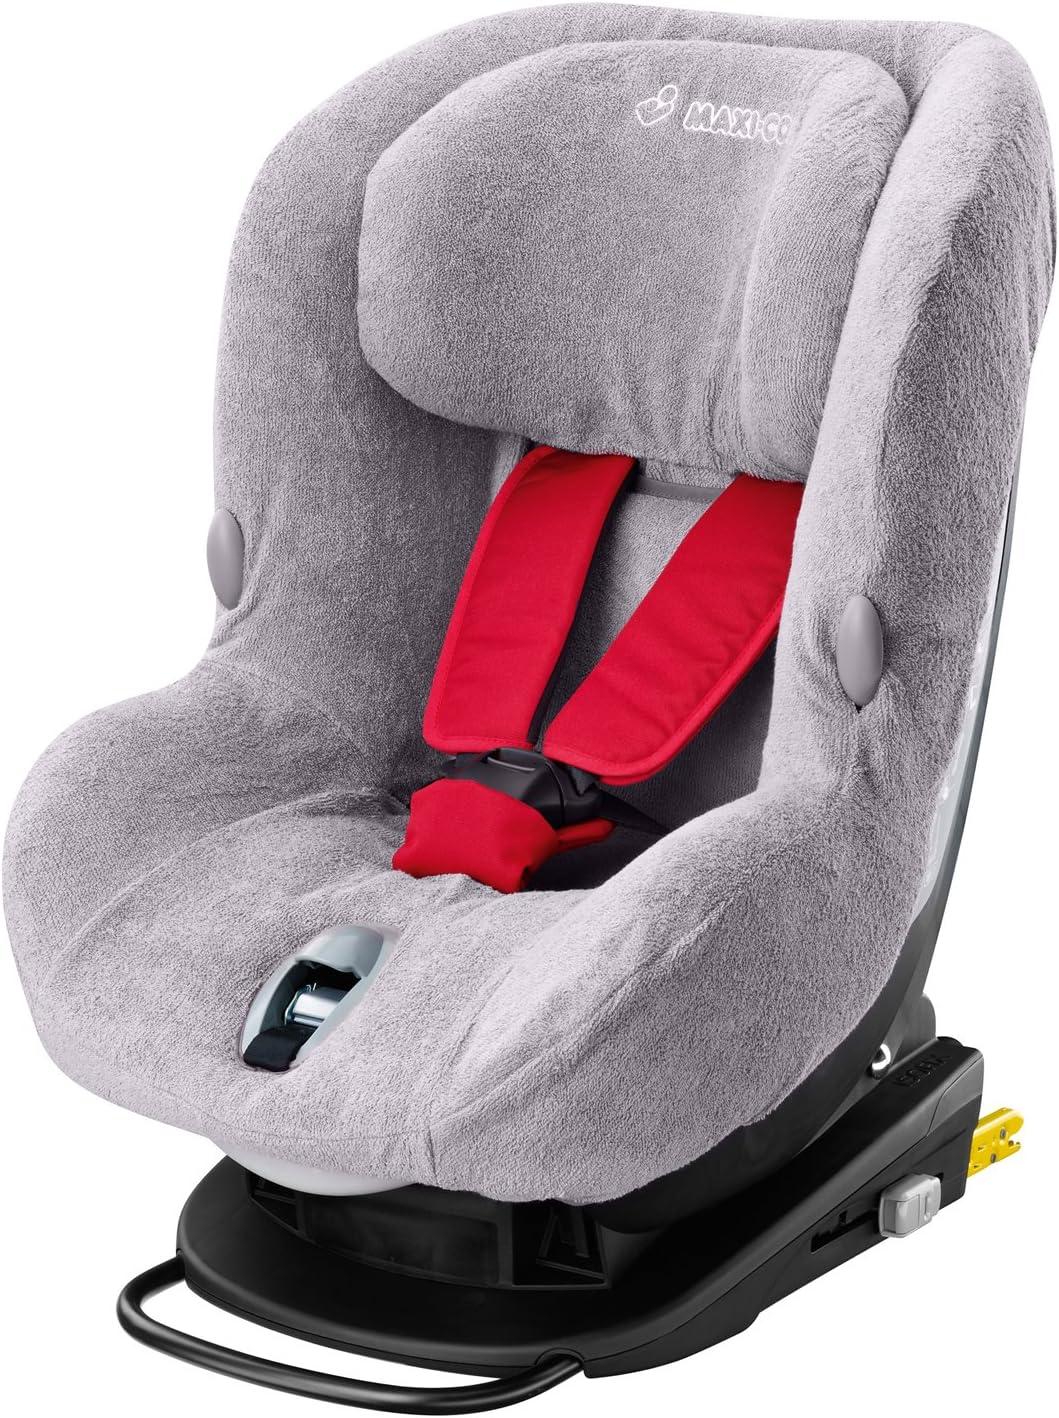 Cobertor de asiento MiloFix color rojo para Maxi-Cosi gris